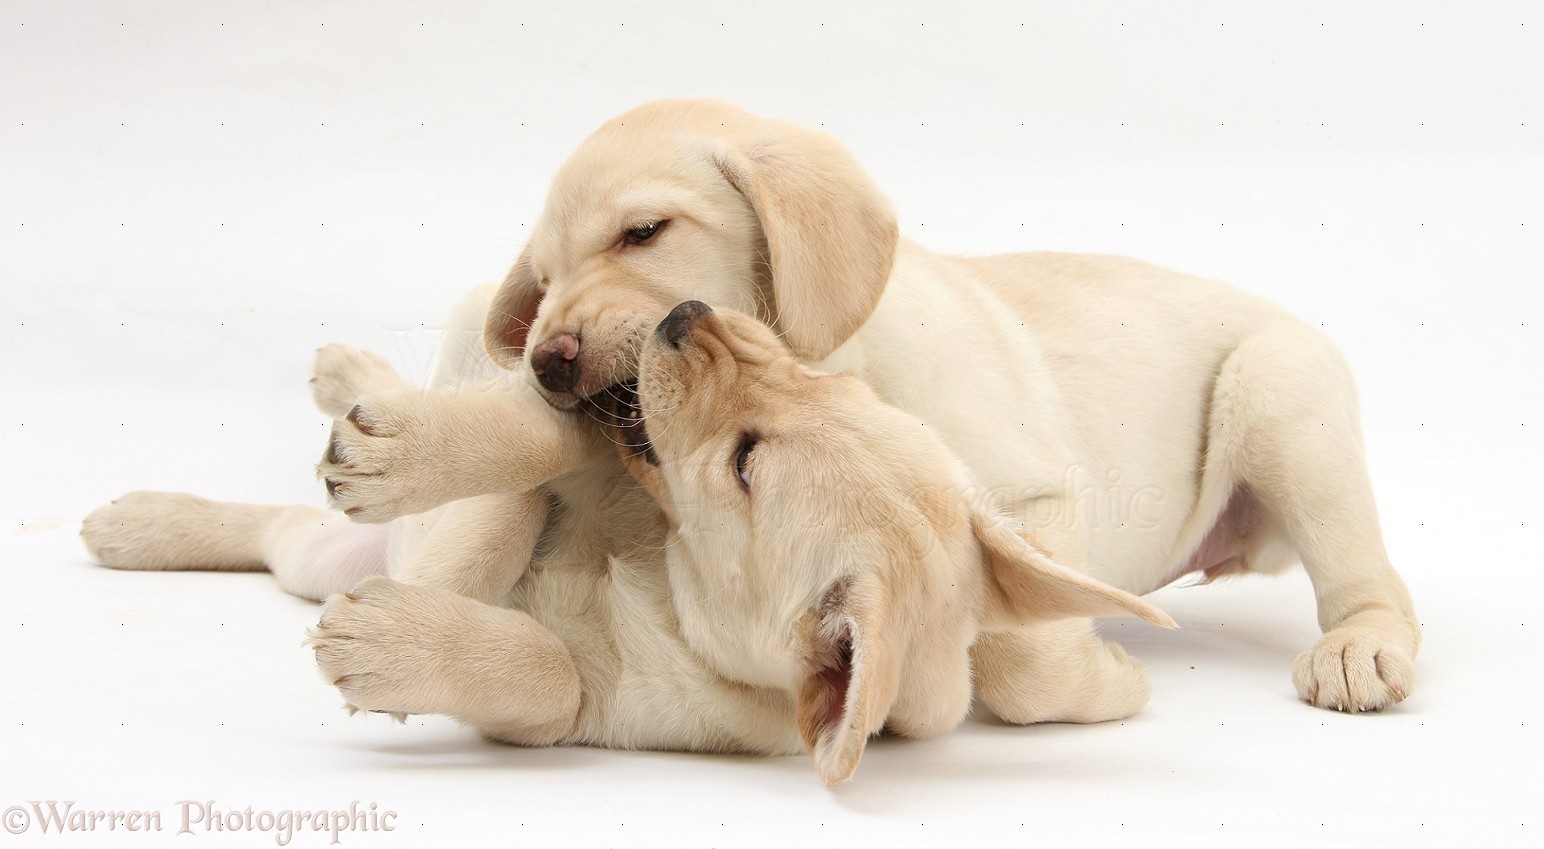 Dogs Yellow Labrador Retriever Puppies Play Fighting